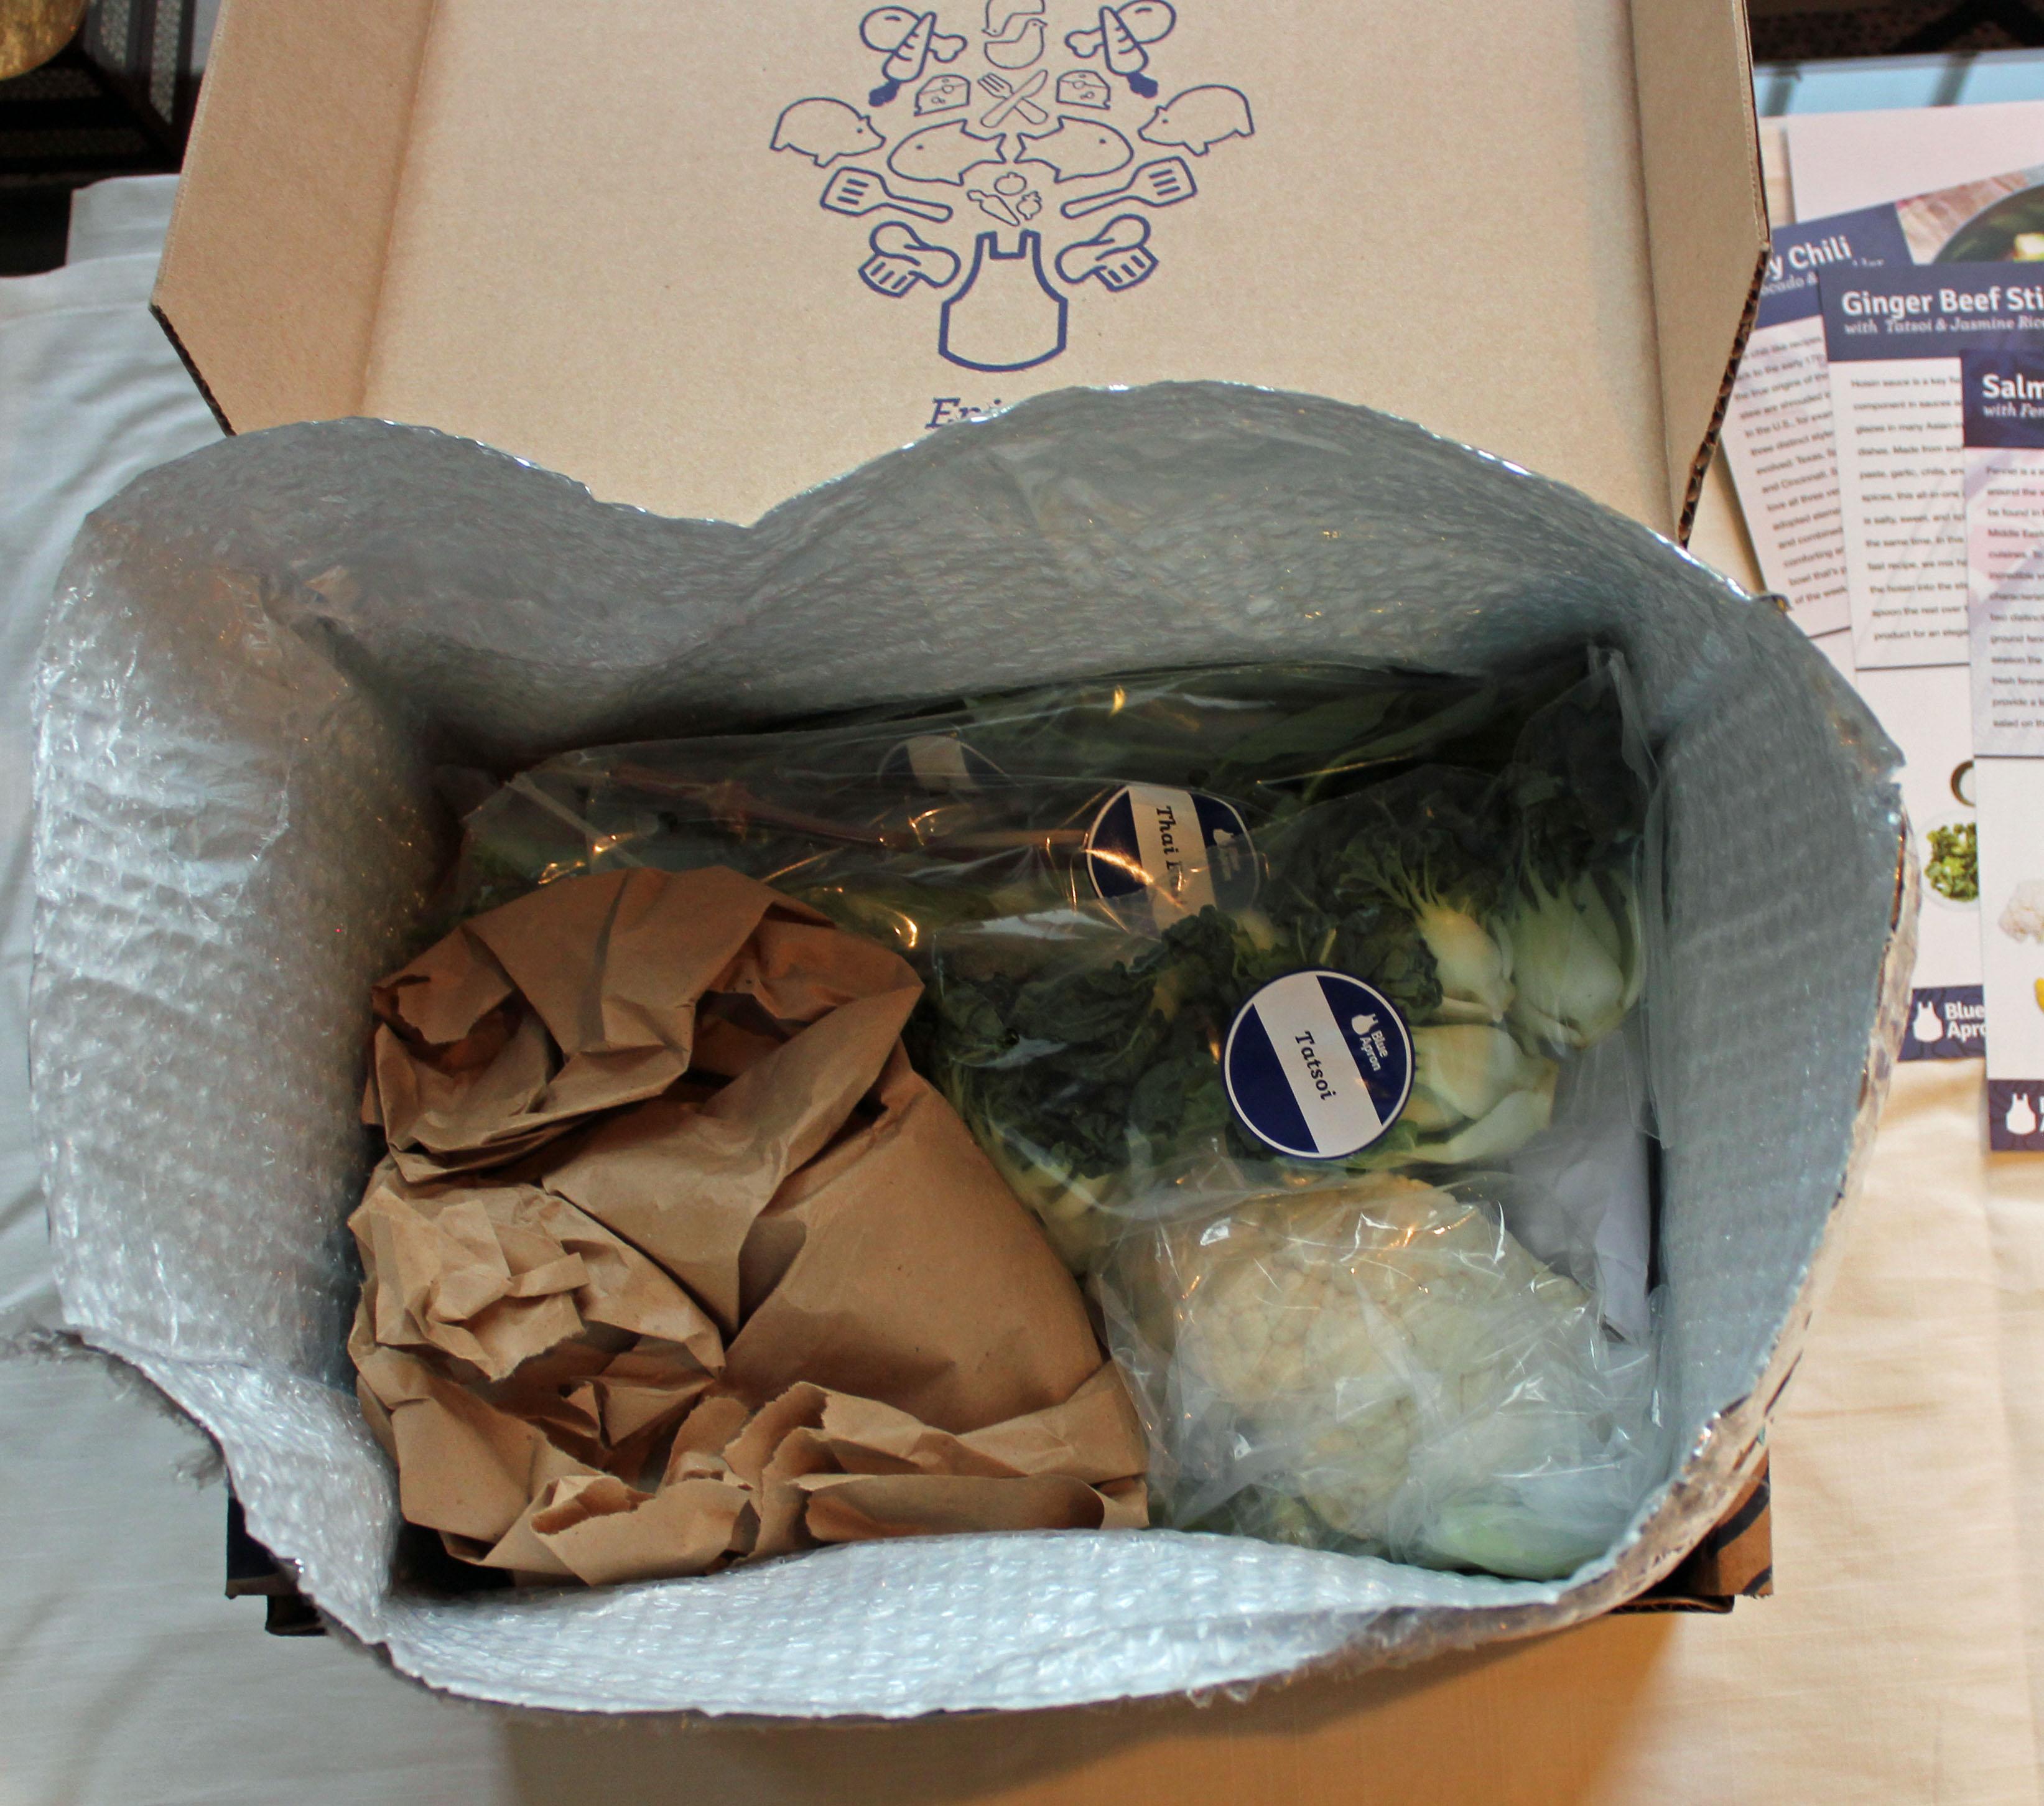 Blue Apron Meal Kit Review | Kitchn